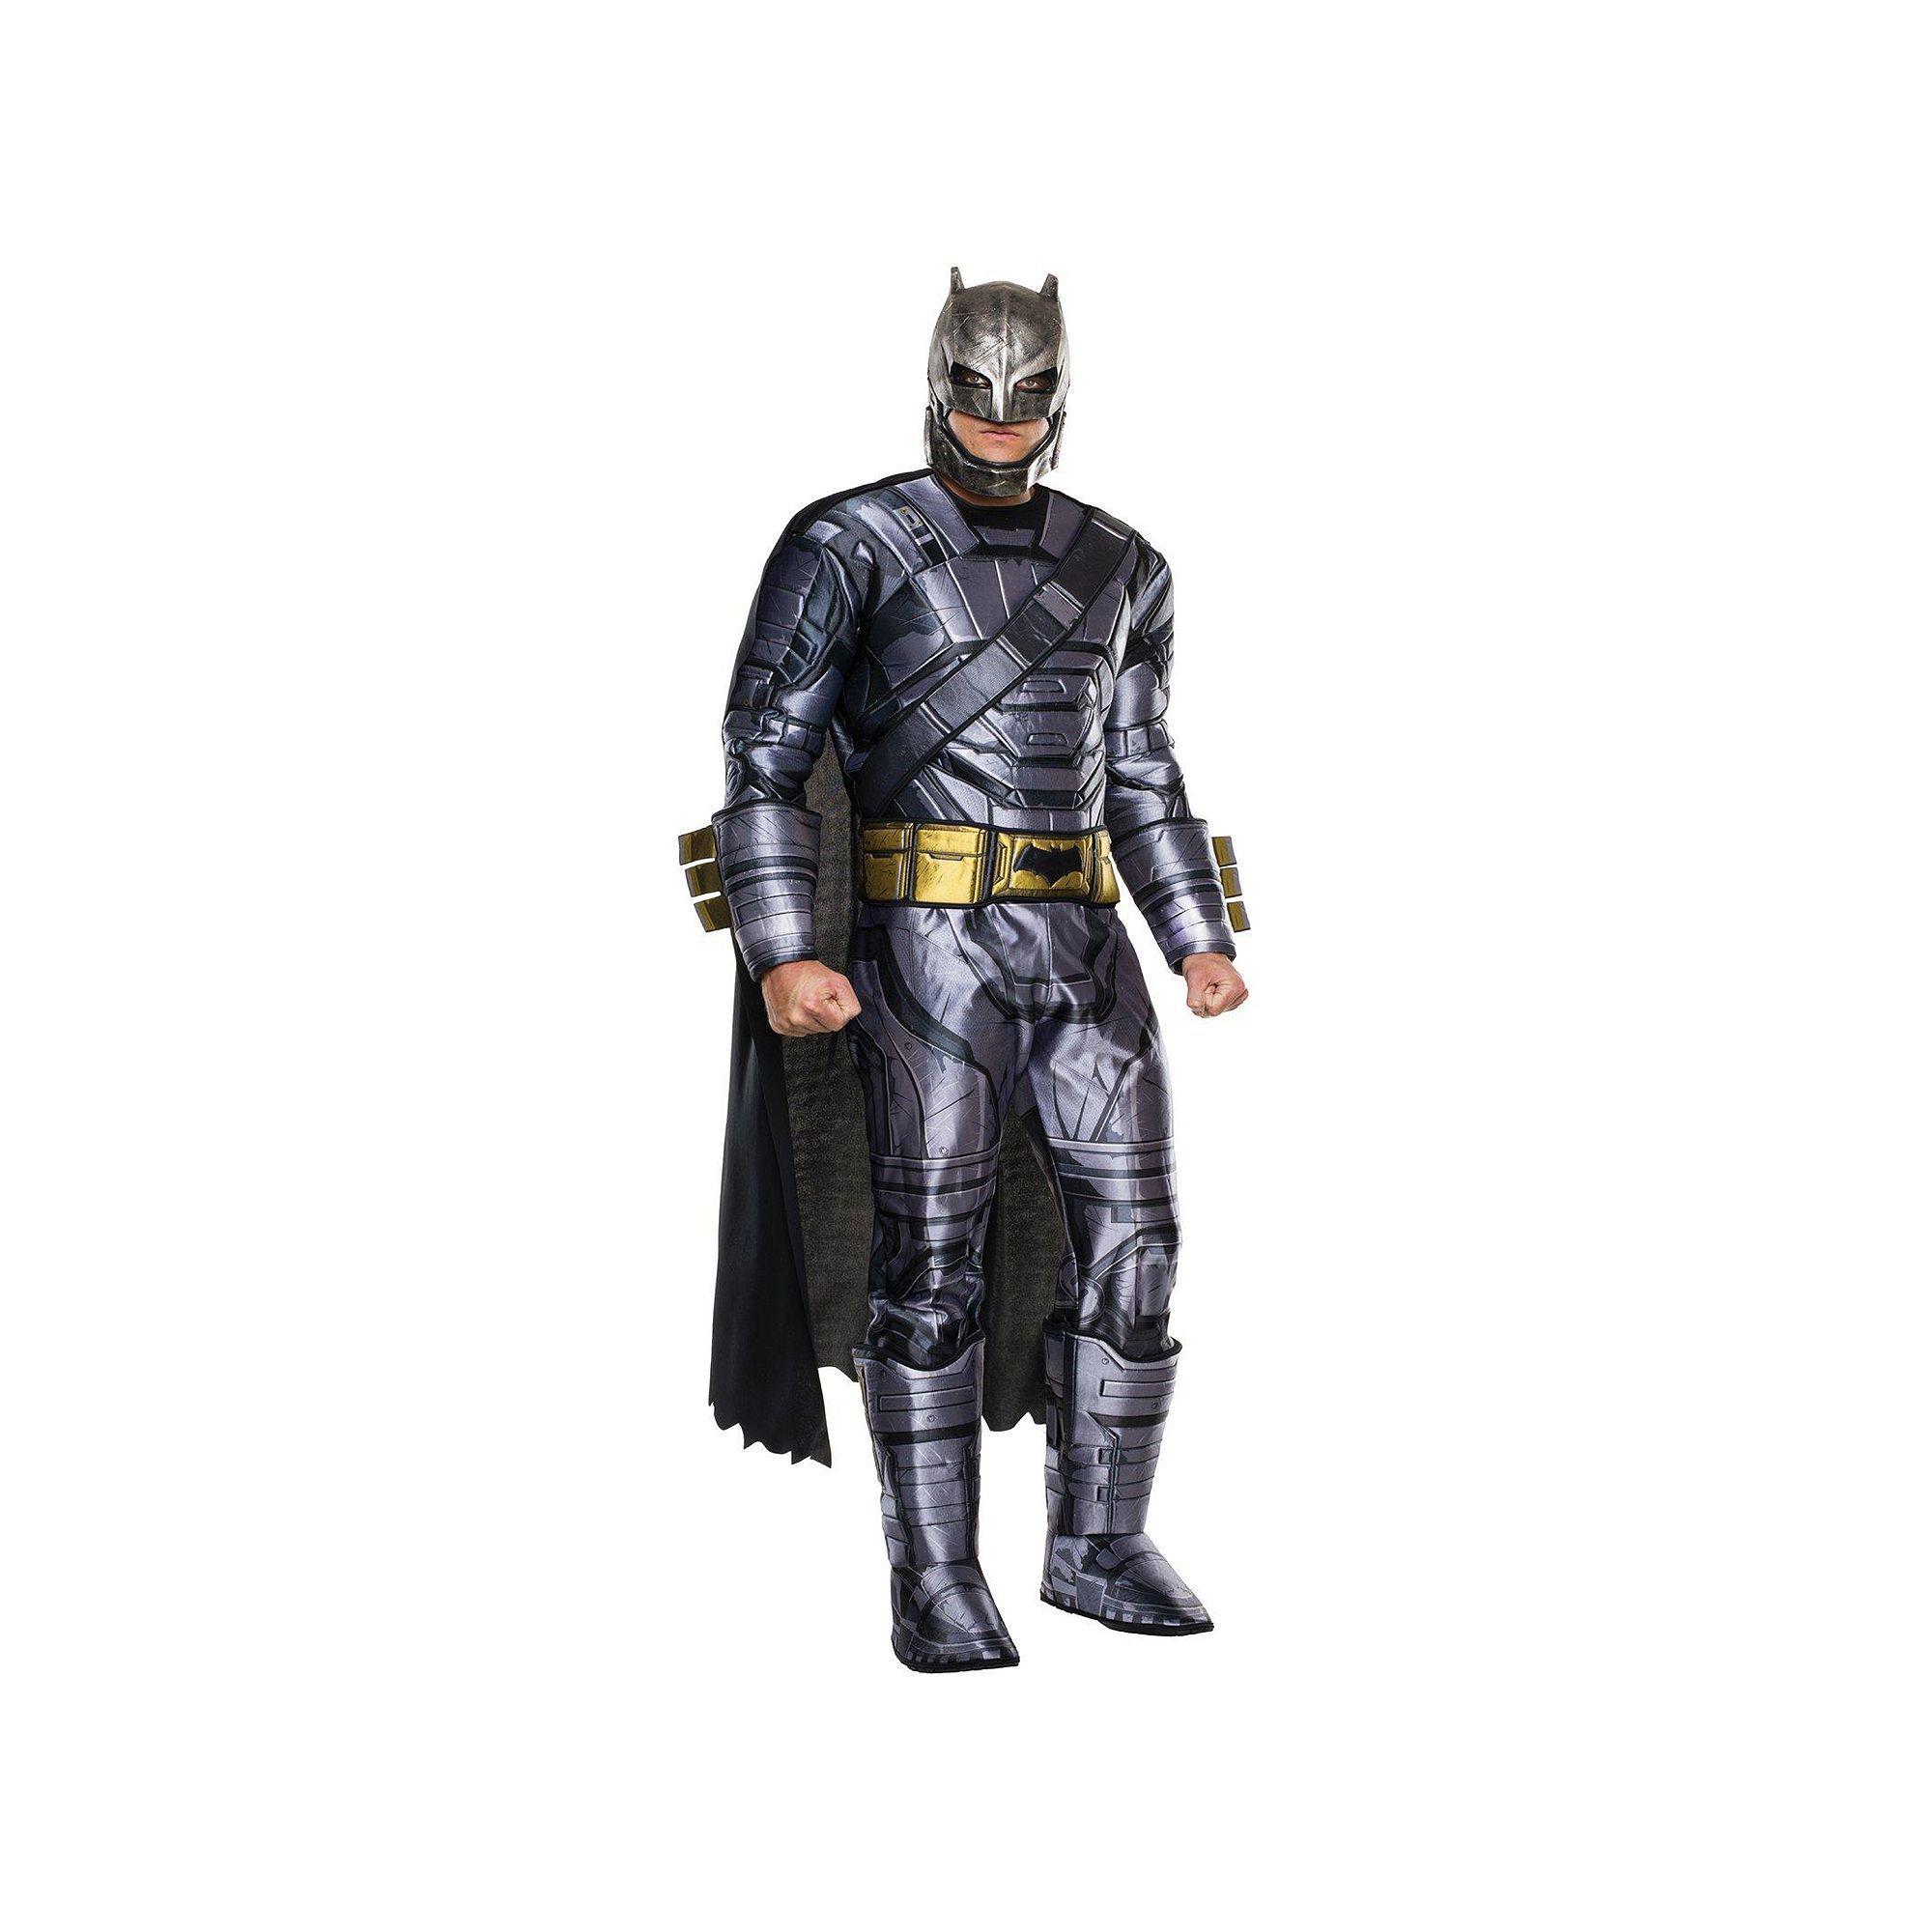 Adult Batman v Superman Dawn of Justice Deluxe Armored Batman Costume Menu0027s Multicolor  sc 1 st  Pinterest & Adult Batman v Superman: Dawn of Justice Deluxe Armored Batman ...